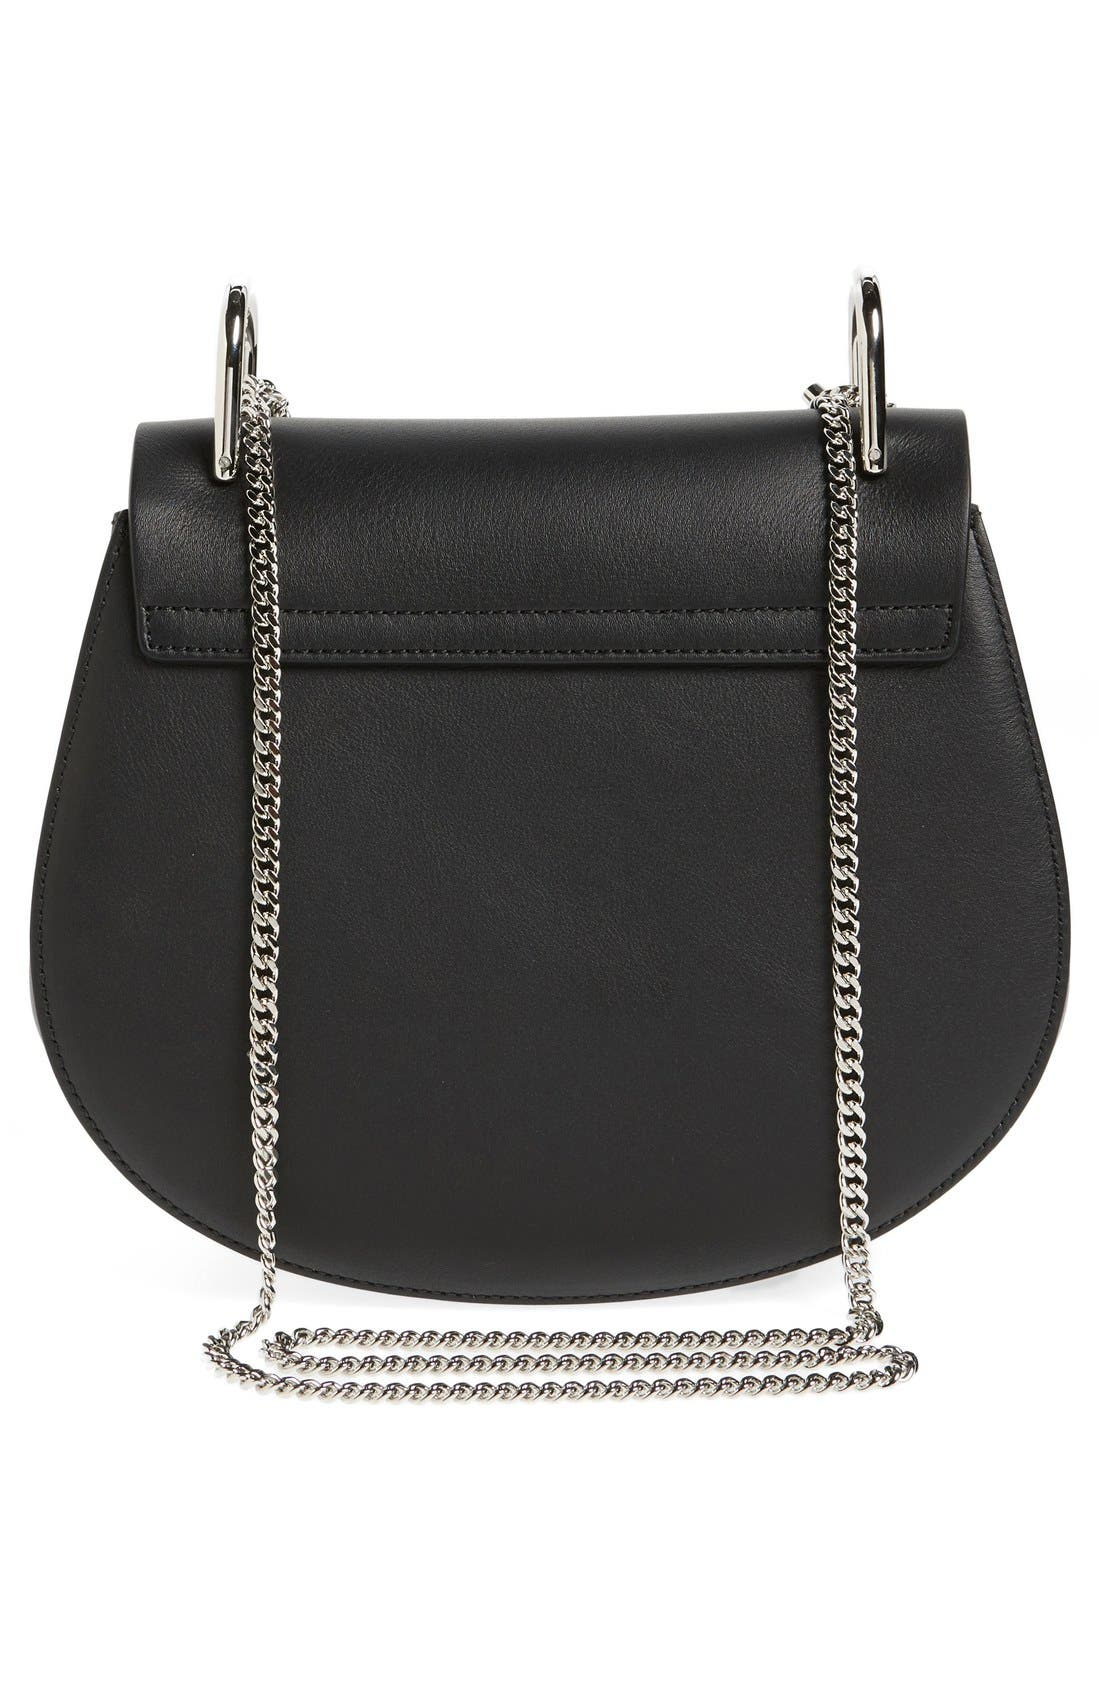 CHLOÉ, Small Drew Leather & Suede Shoulder Bag, Alternate thumbnail 6, color, 001